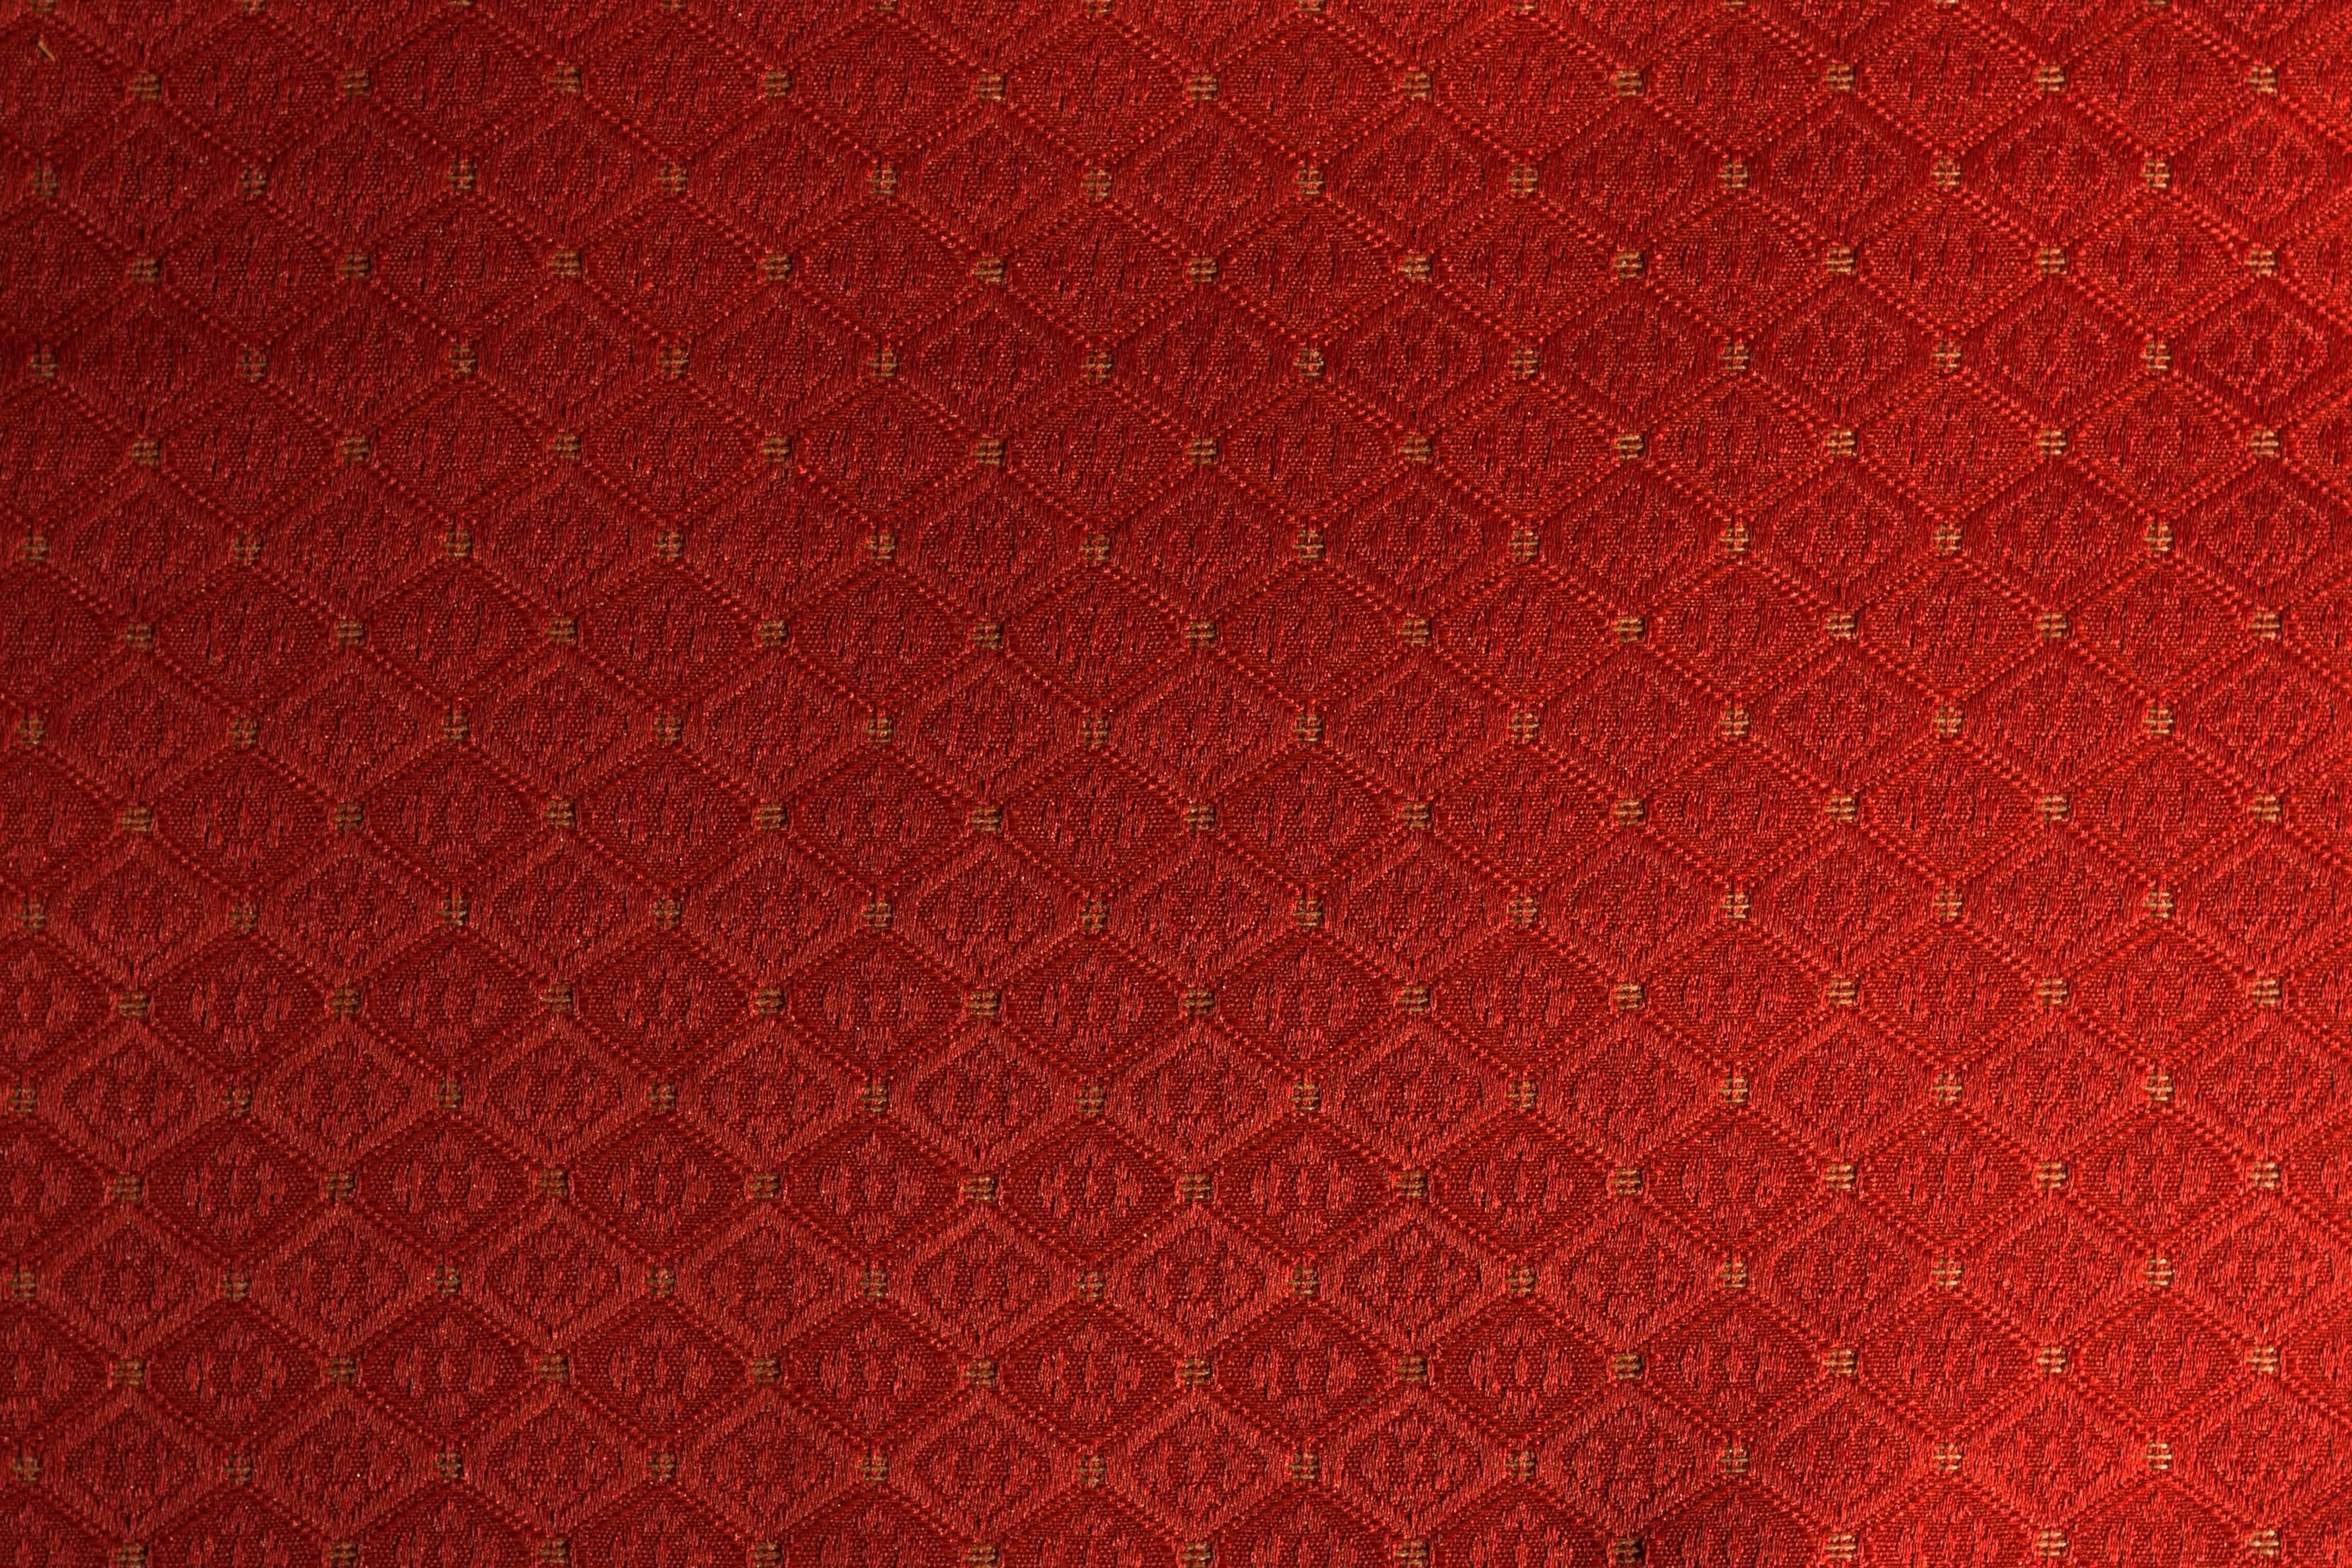 Download texture red velvet background texture red velvet fabric 3320x2214